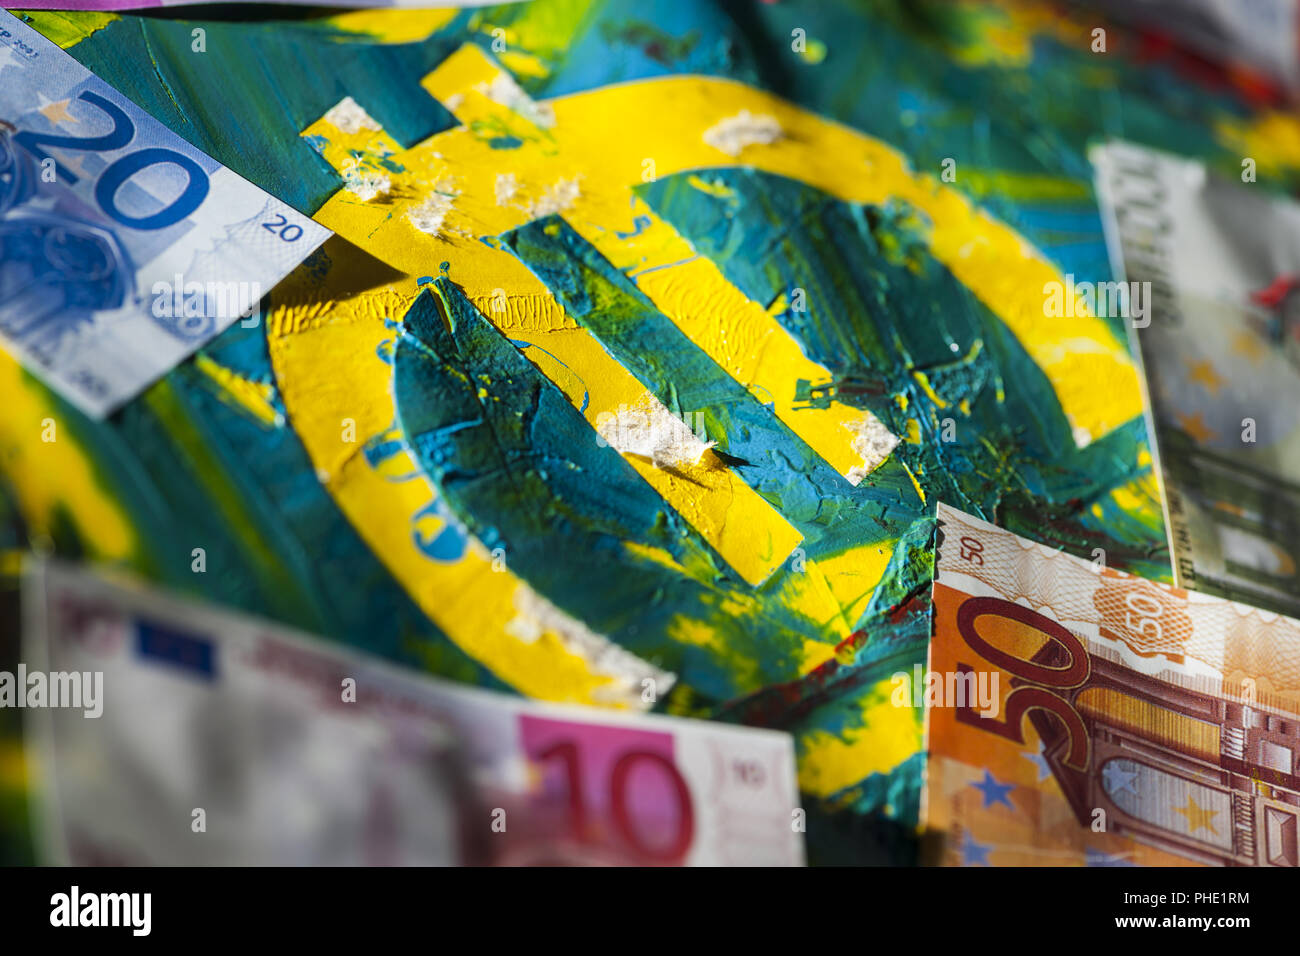 Acryl Color Splash Stock Photos & Acryl Color Splash Stock Images ...